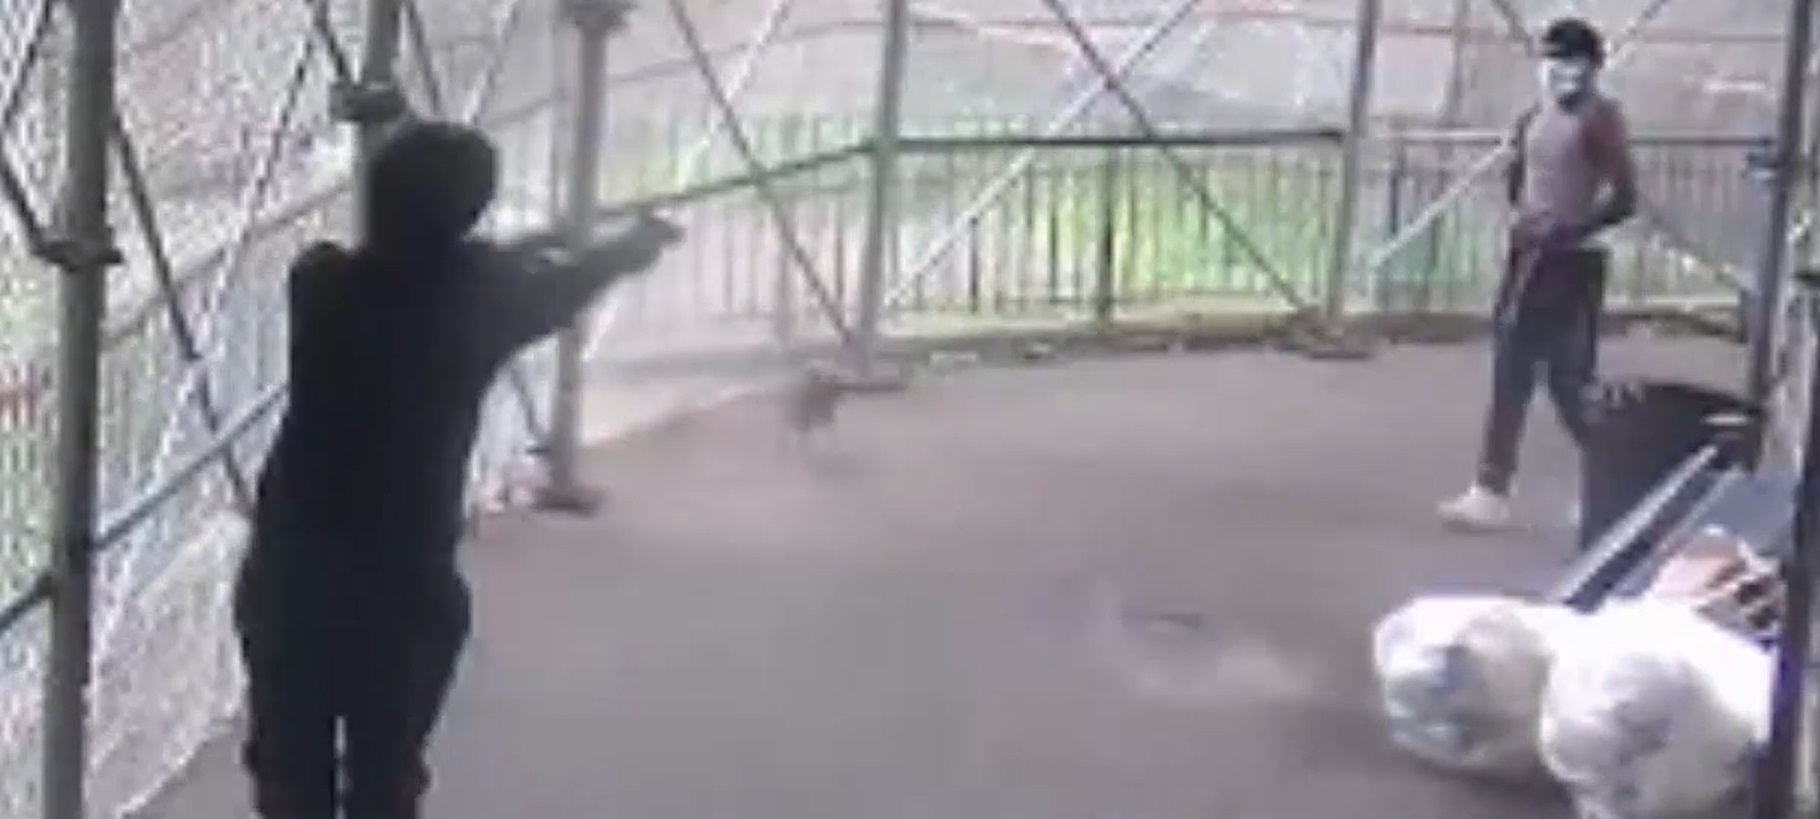 manhattan stoop shooting suspect